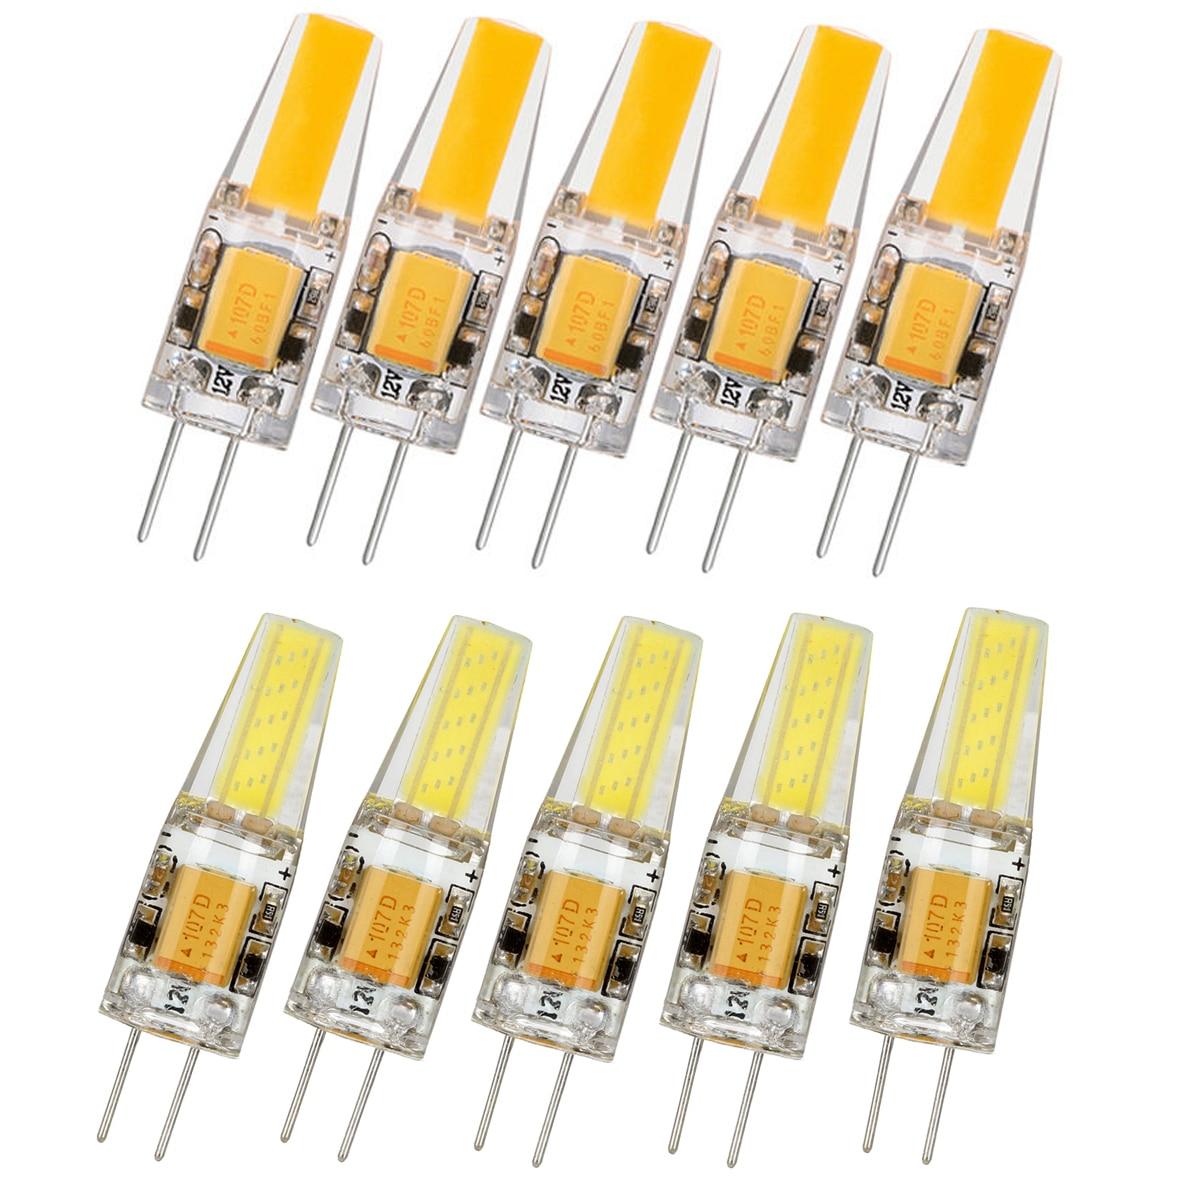 Led Halogen Bulb Diagram International 4700 Wiring Pdf 1set 4 10pcs Dimmable G4 Cob Capsule 3w 6w